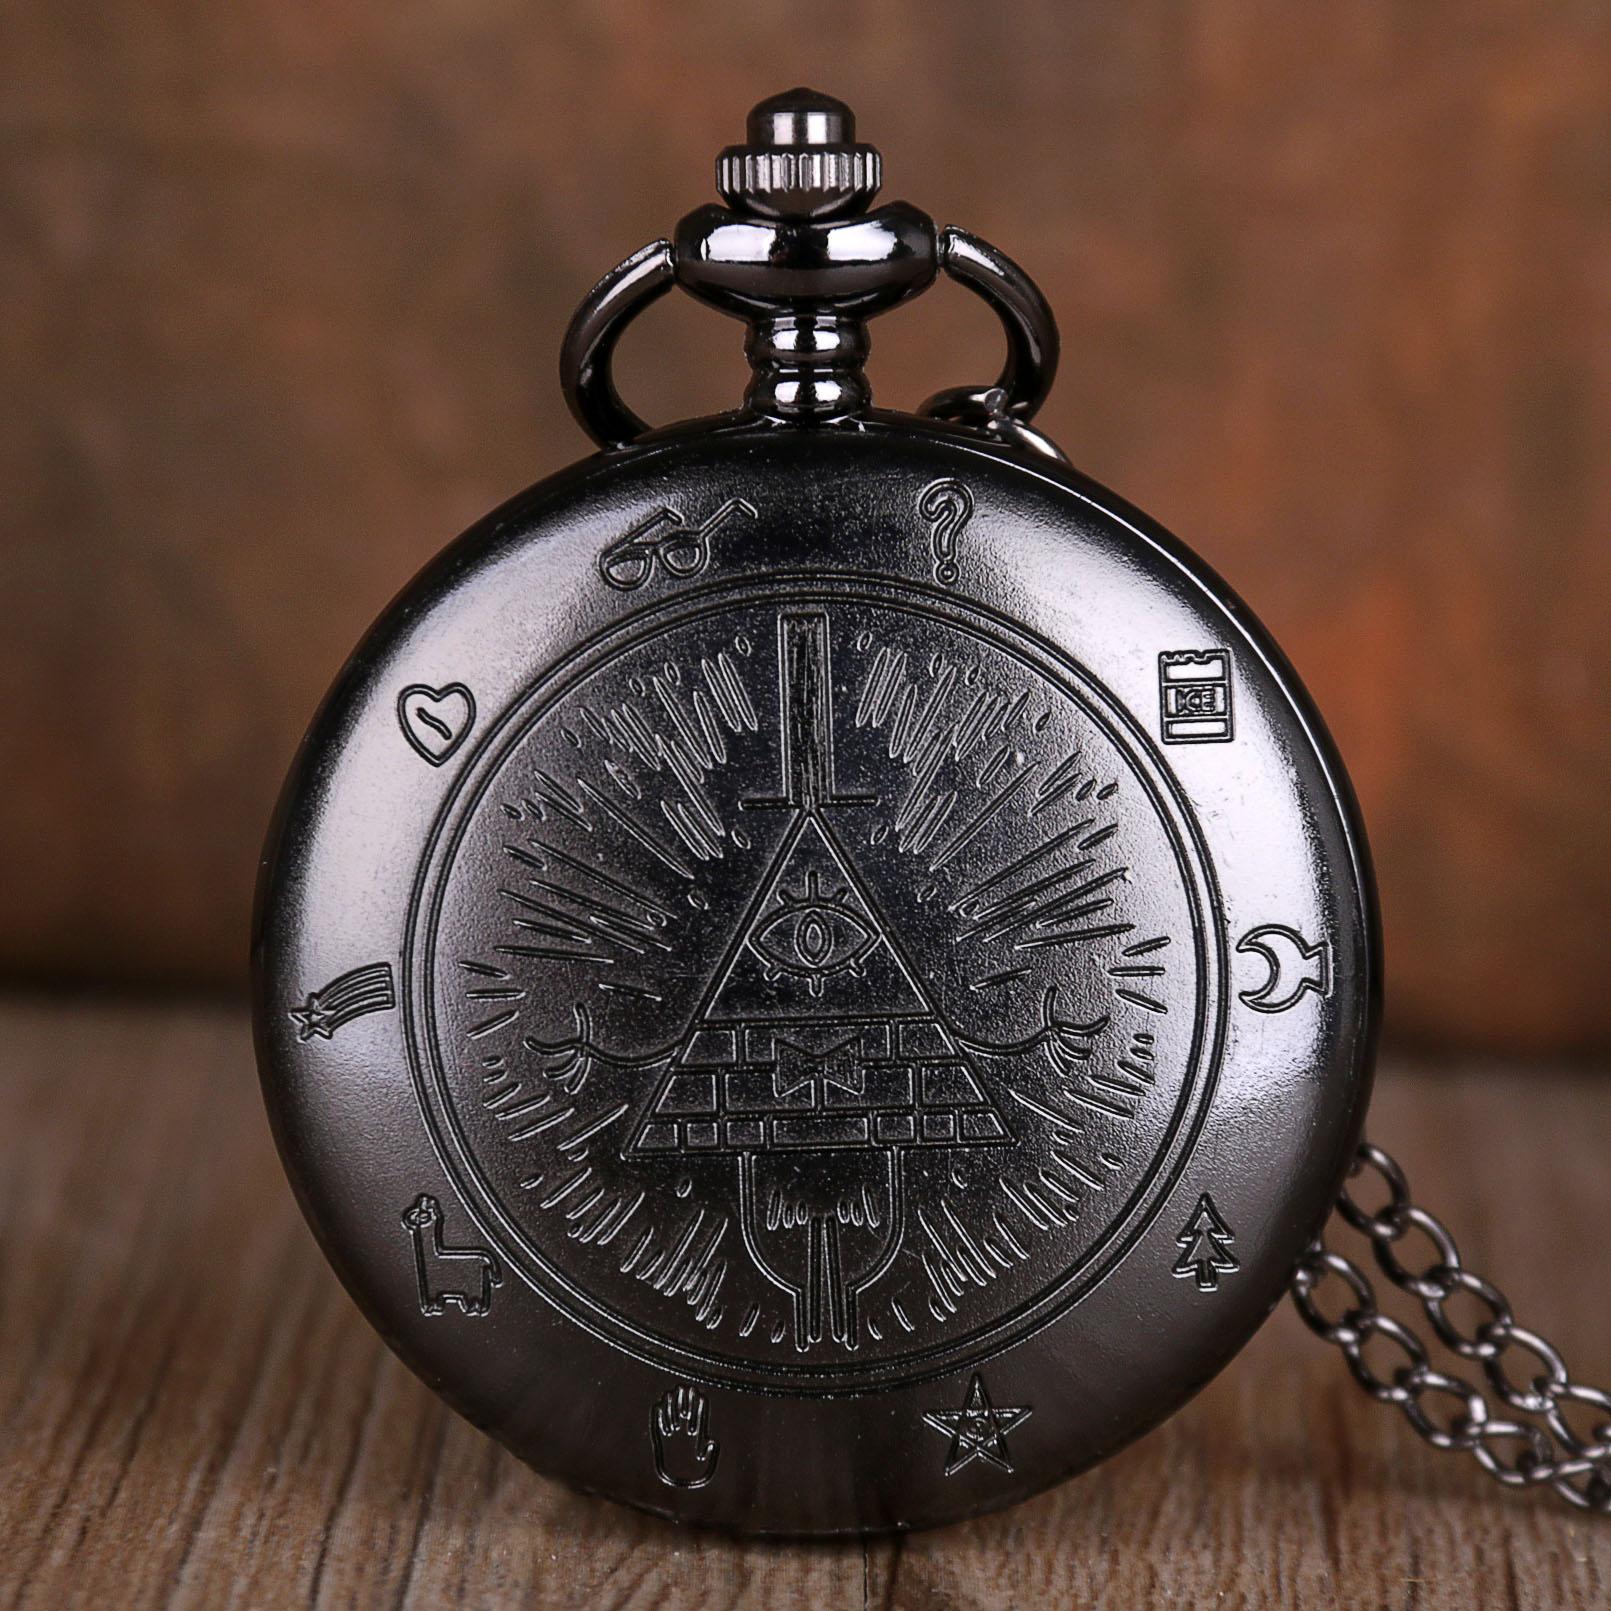 Vintage Bill Cipher Gravity Falls Quartz Pocket Watch Analog Retro Pendant Necklace Men Women Kid Fob Watches With Chain